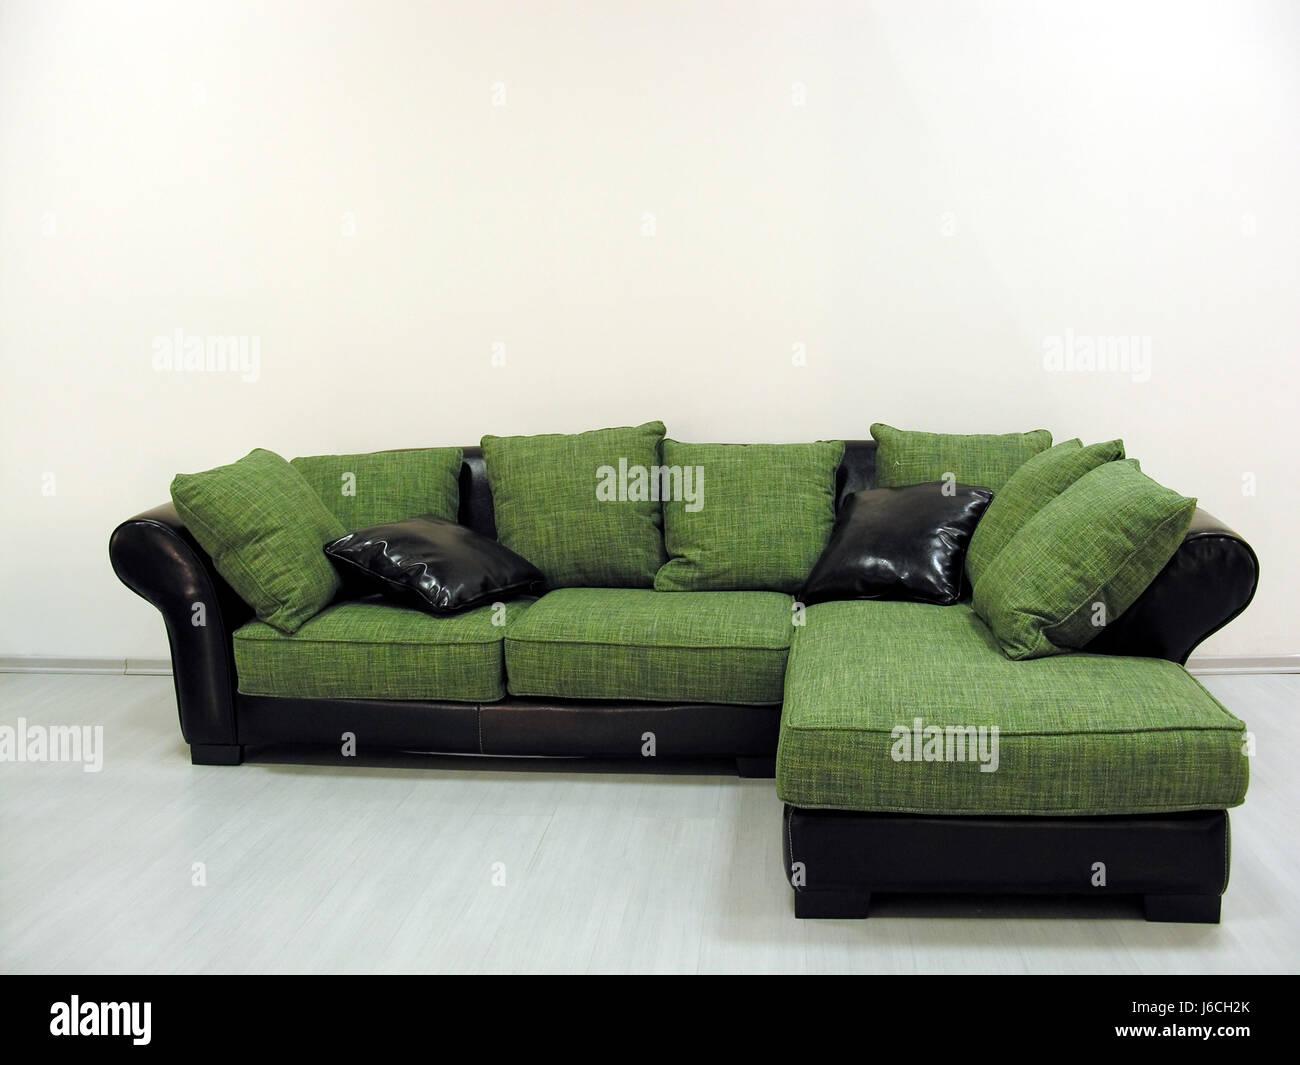 Ottoman Furniture Stock Photos Amp Ottoman Furniture Stock